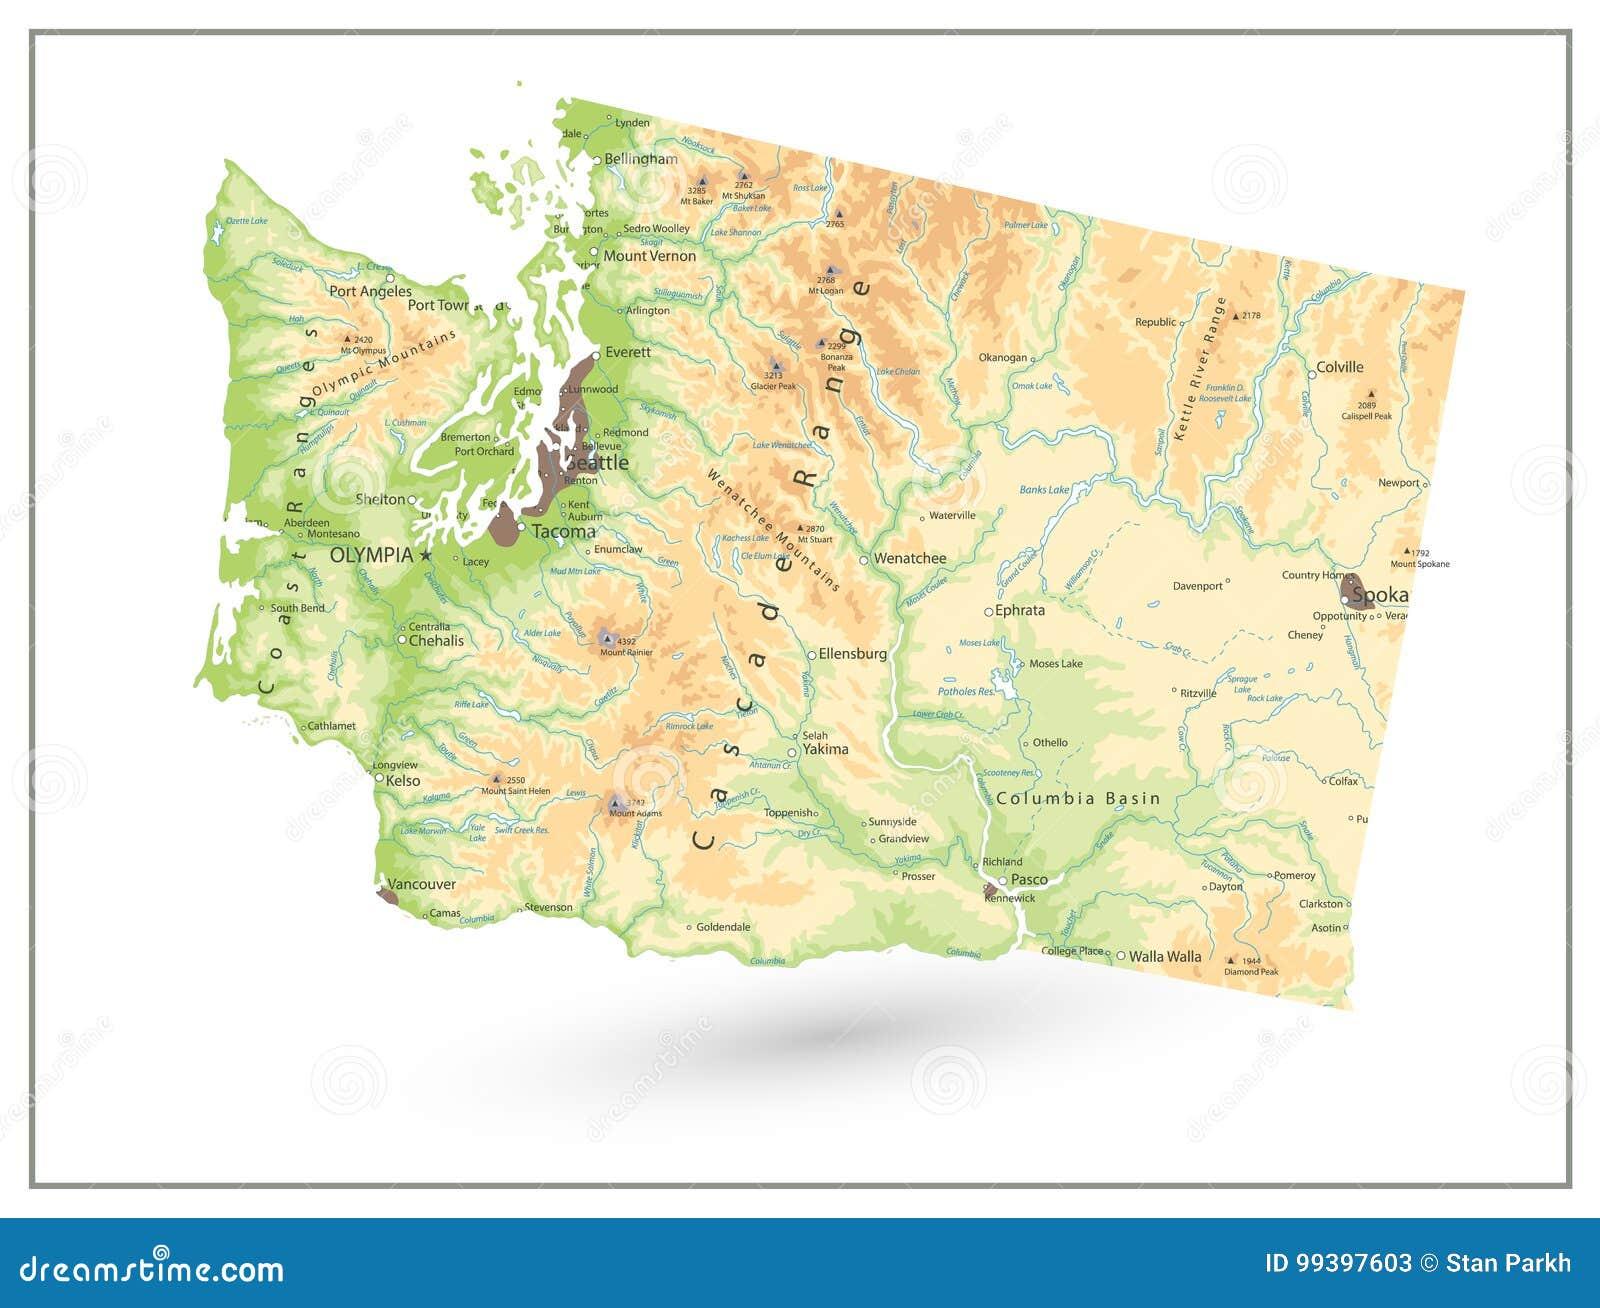 Map Of Washington State on